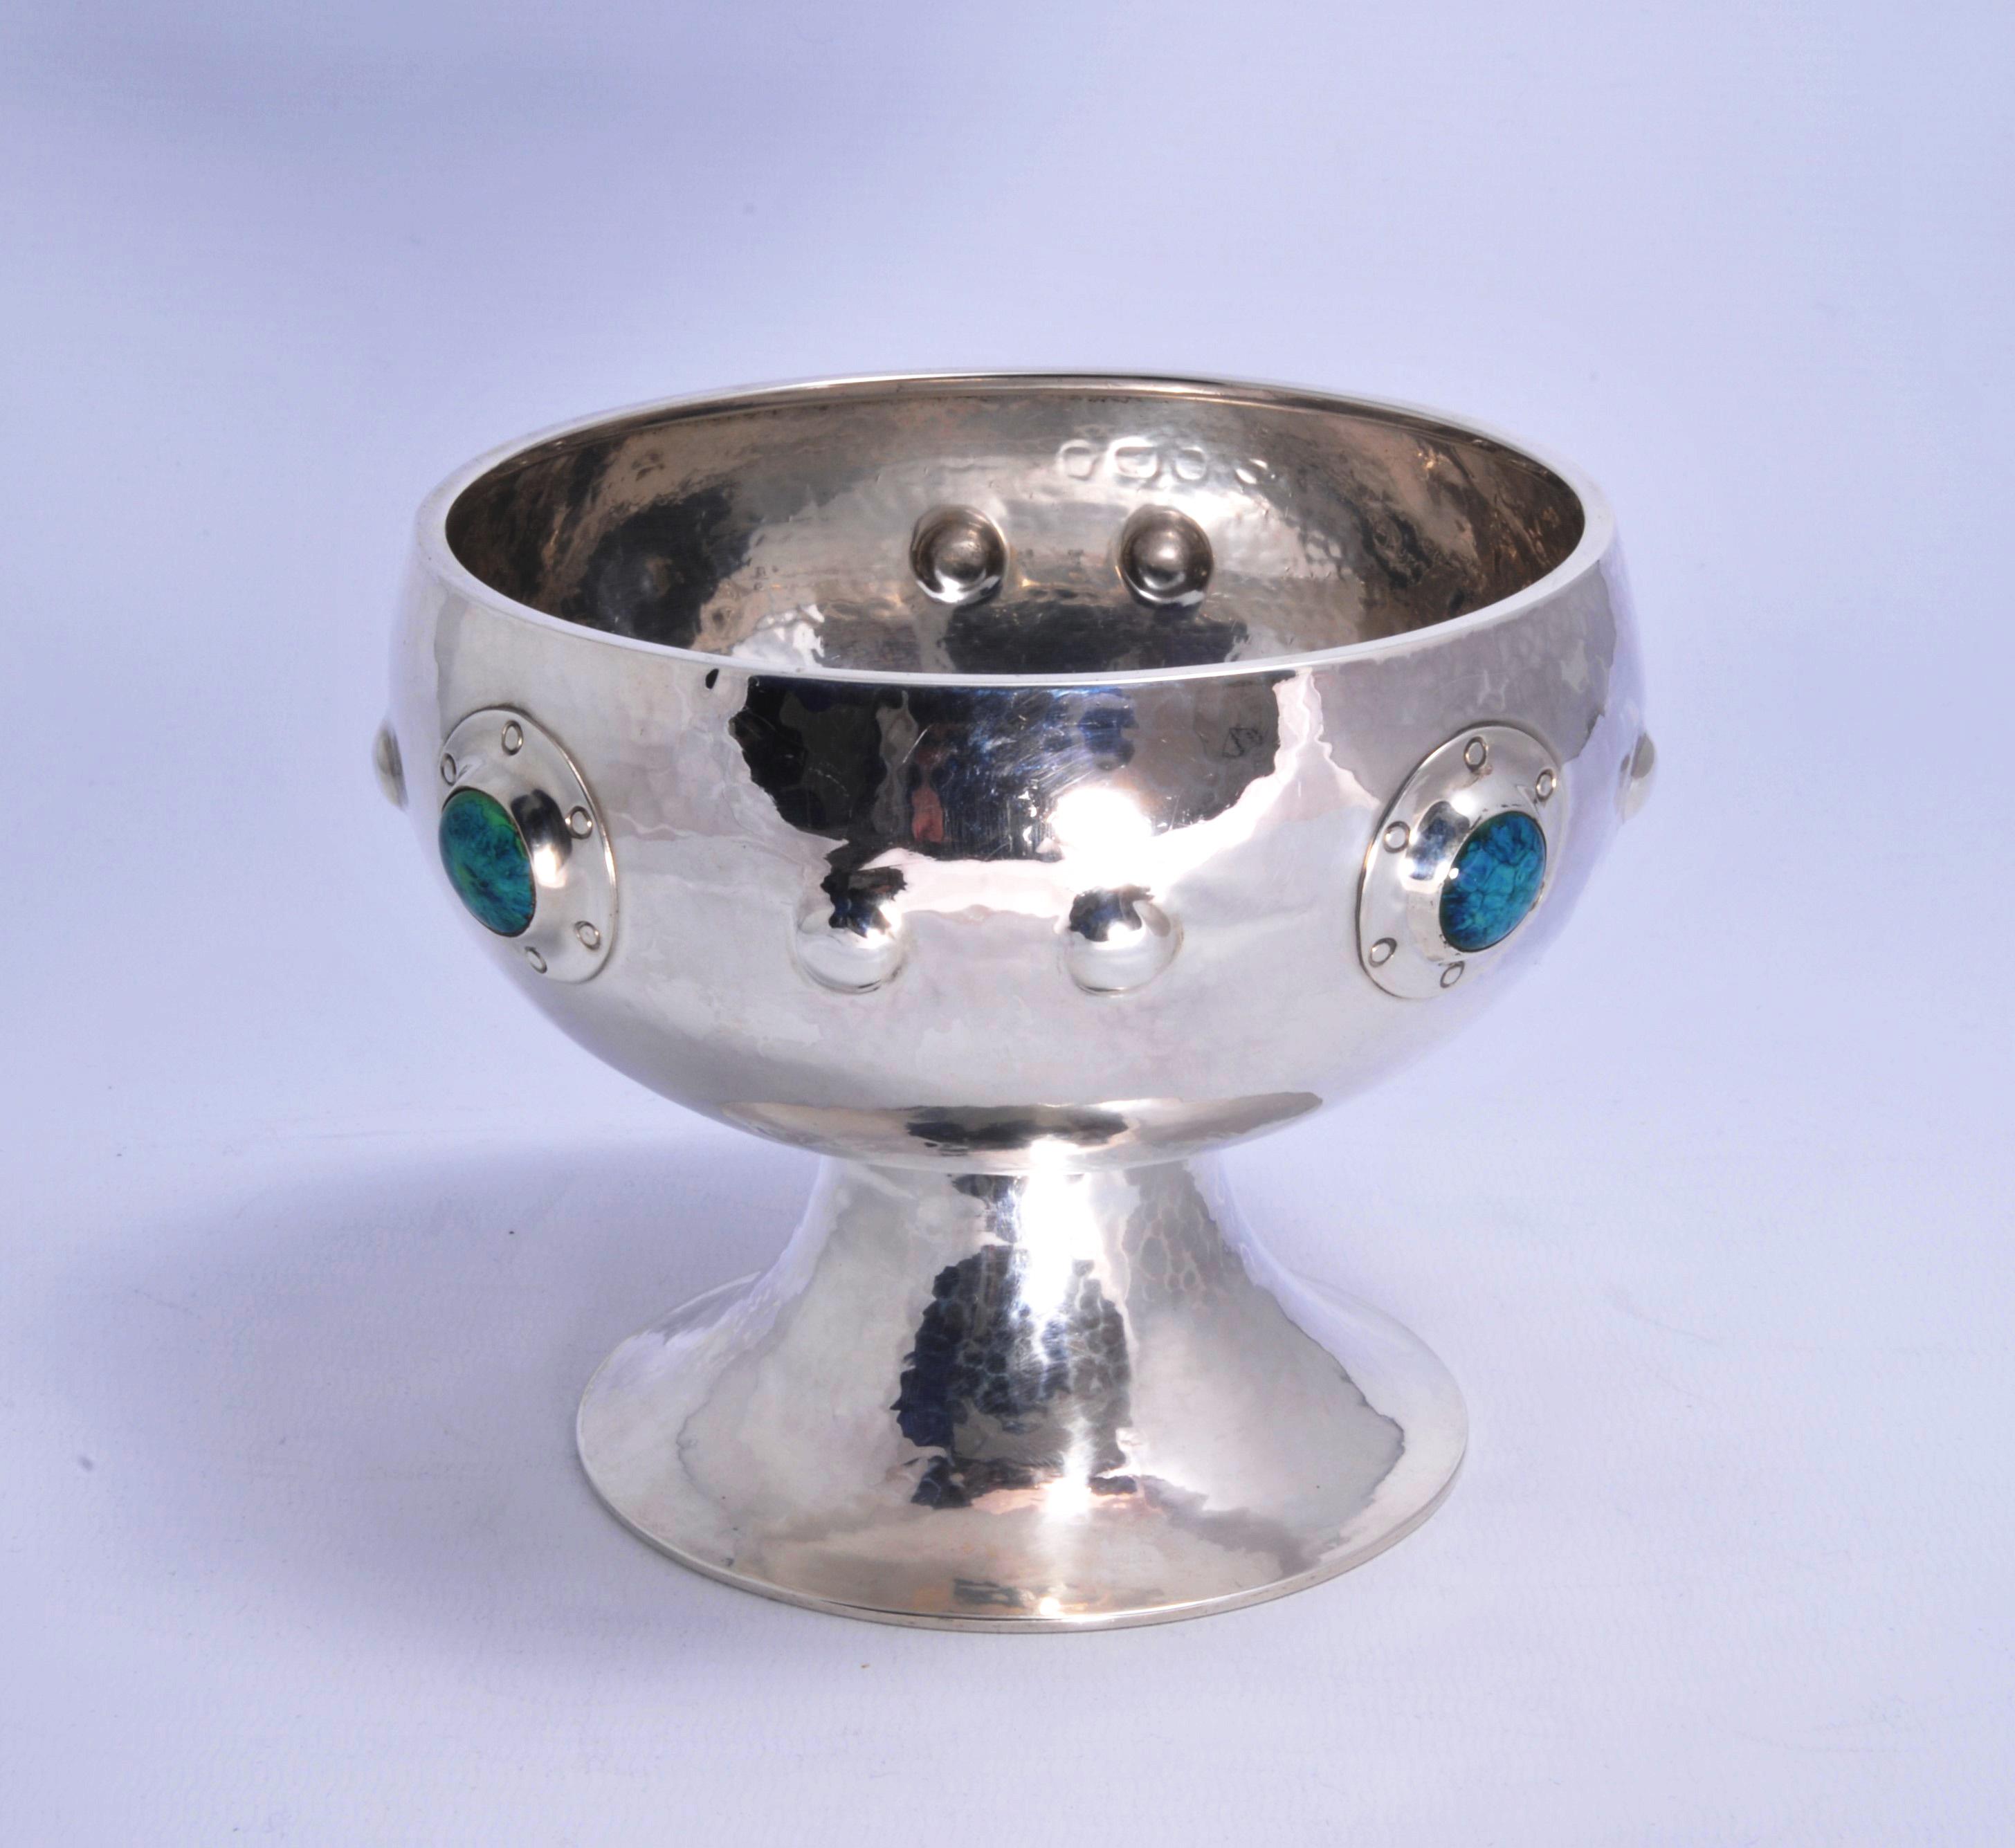 A E Jones Ruskin set footed bowl